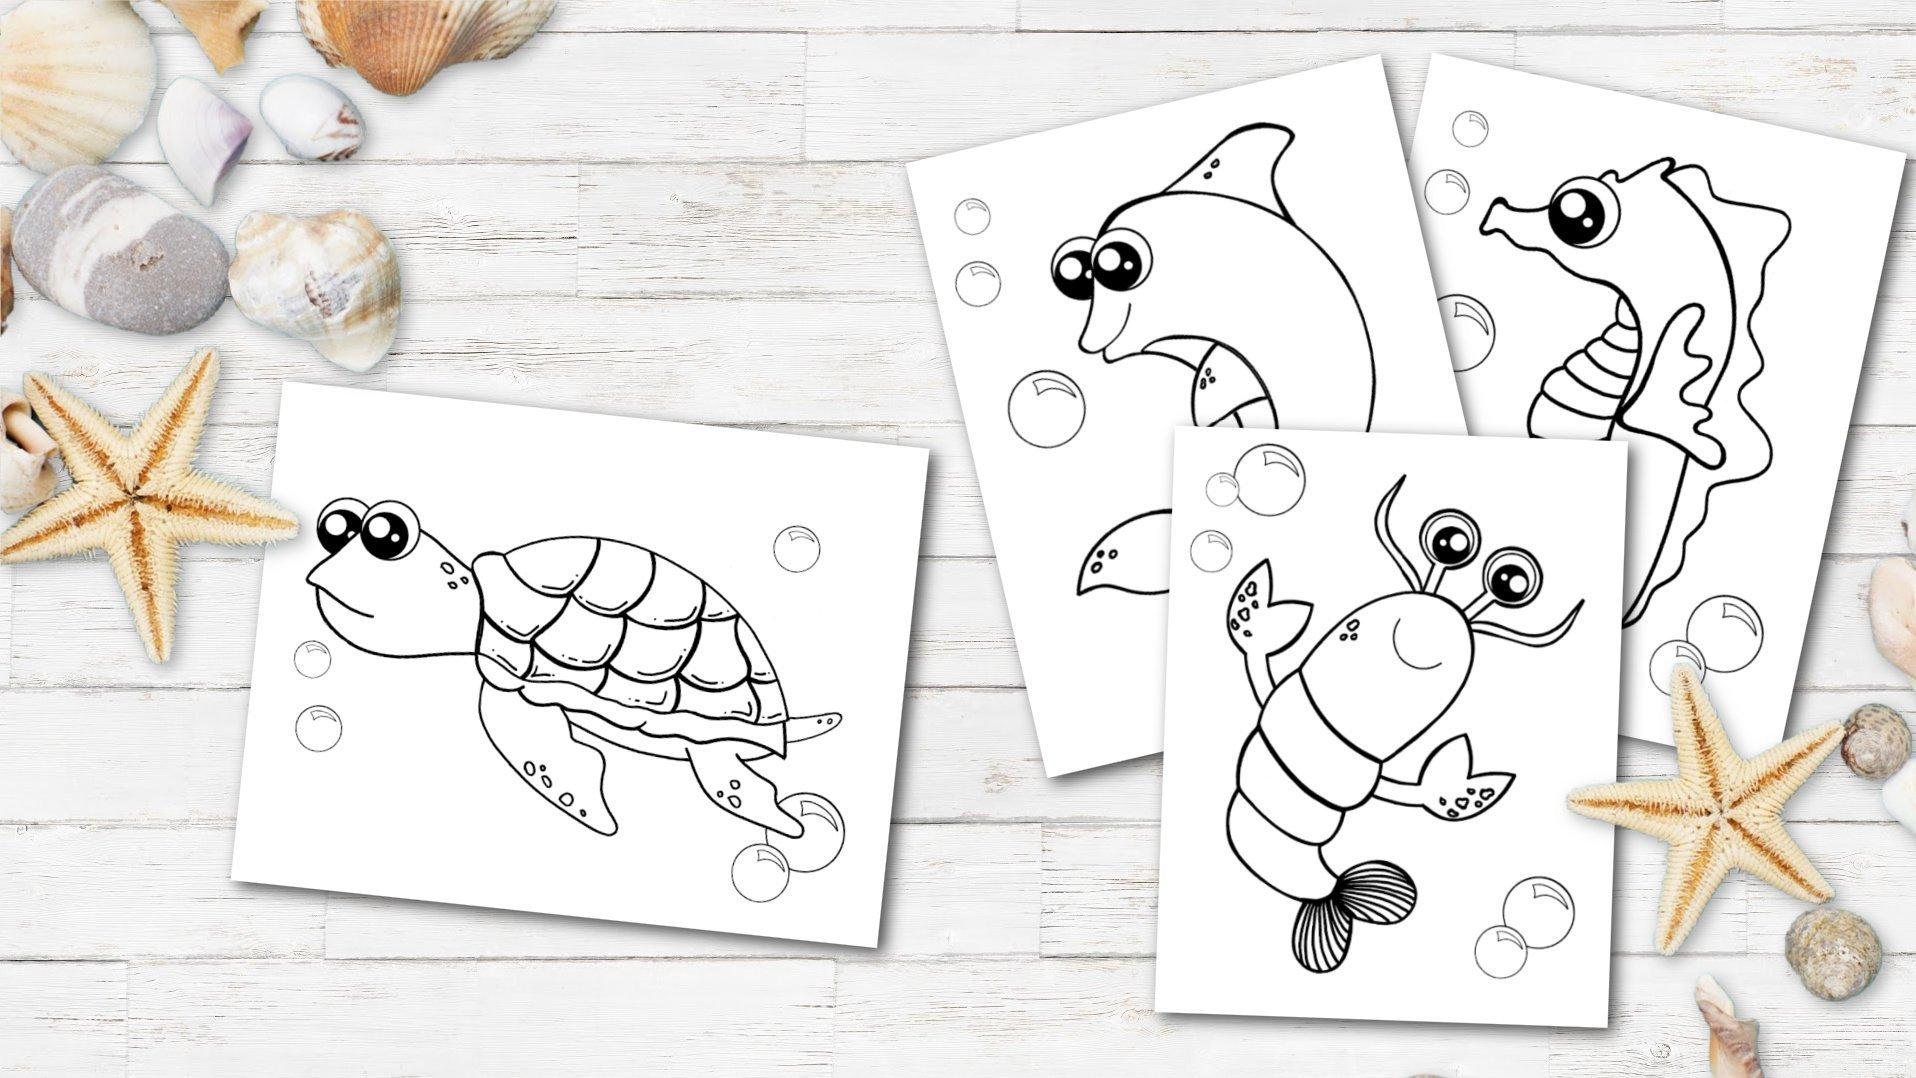 Printable Ocean Animal Coloring Book for kids, preschoolers and toddlers